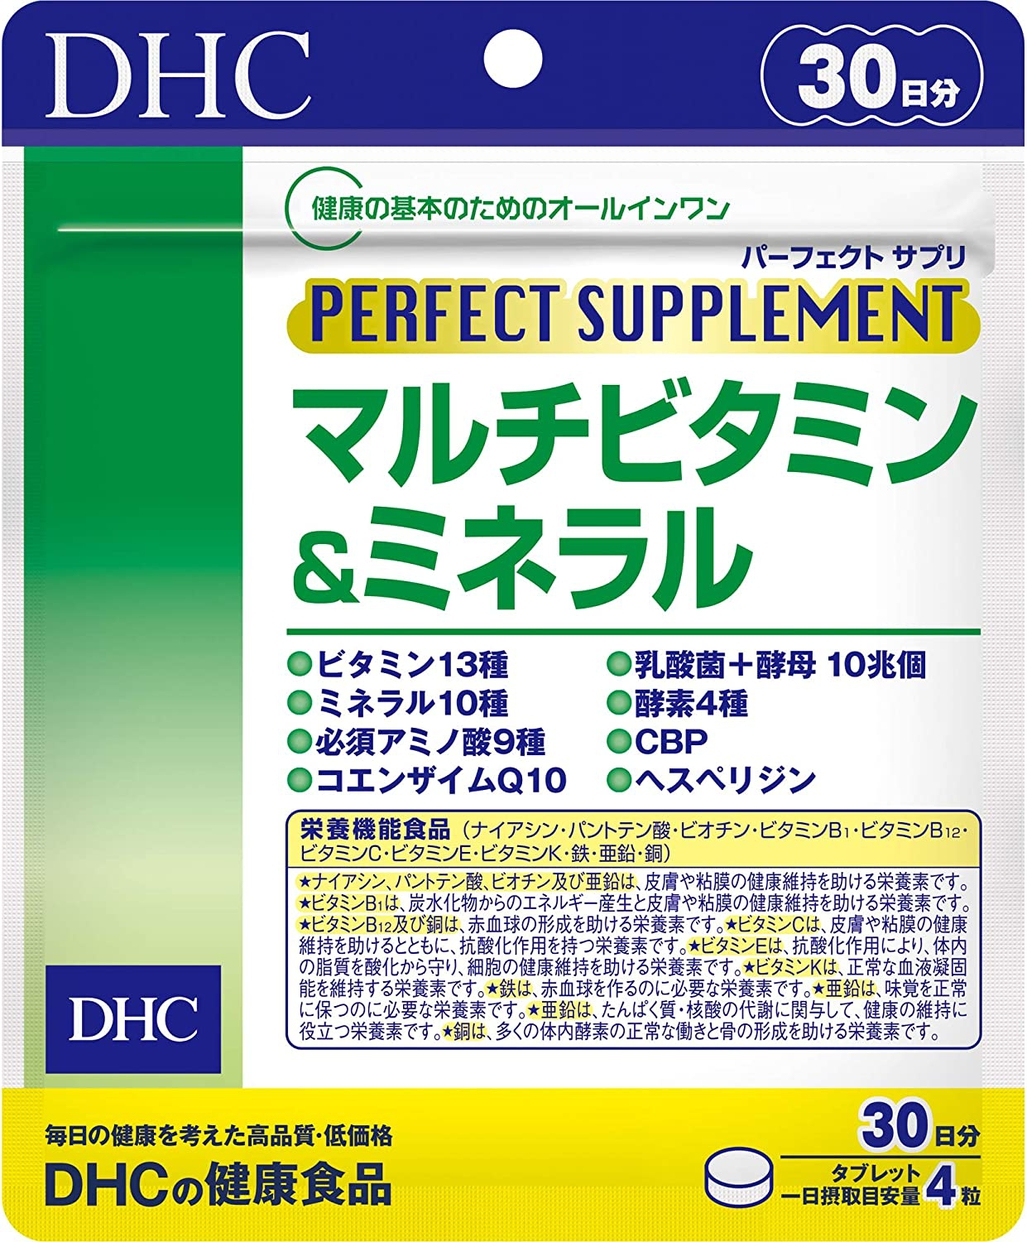 DHC(ディーエイチシー) パーフェクトサプリ マルチビタミン&ミネラル